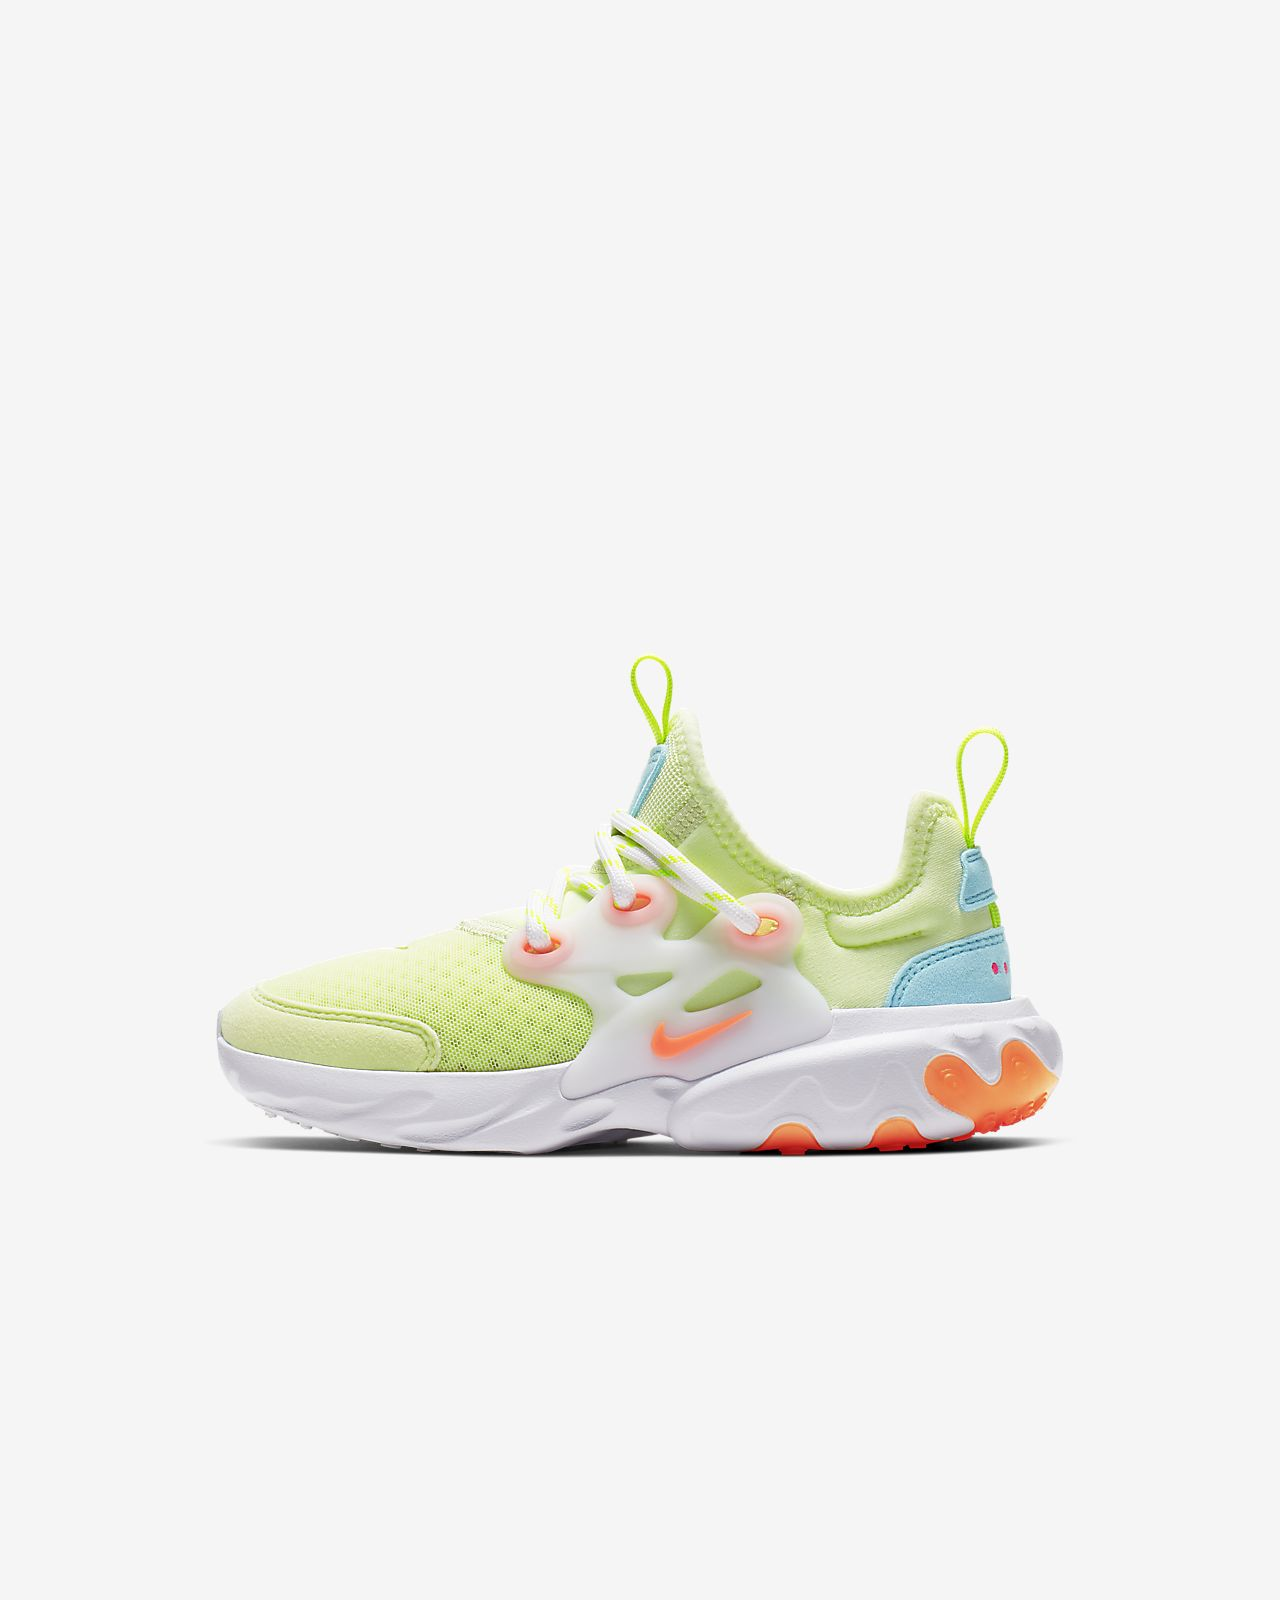 big sale a7e38 3ee20 ... Nike React Presto Little Kids  Shoe